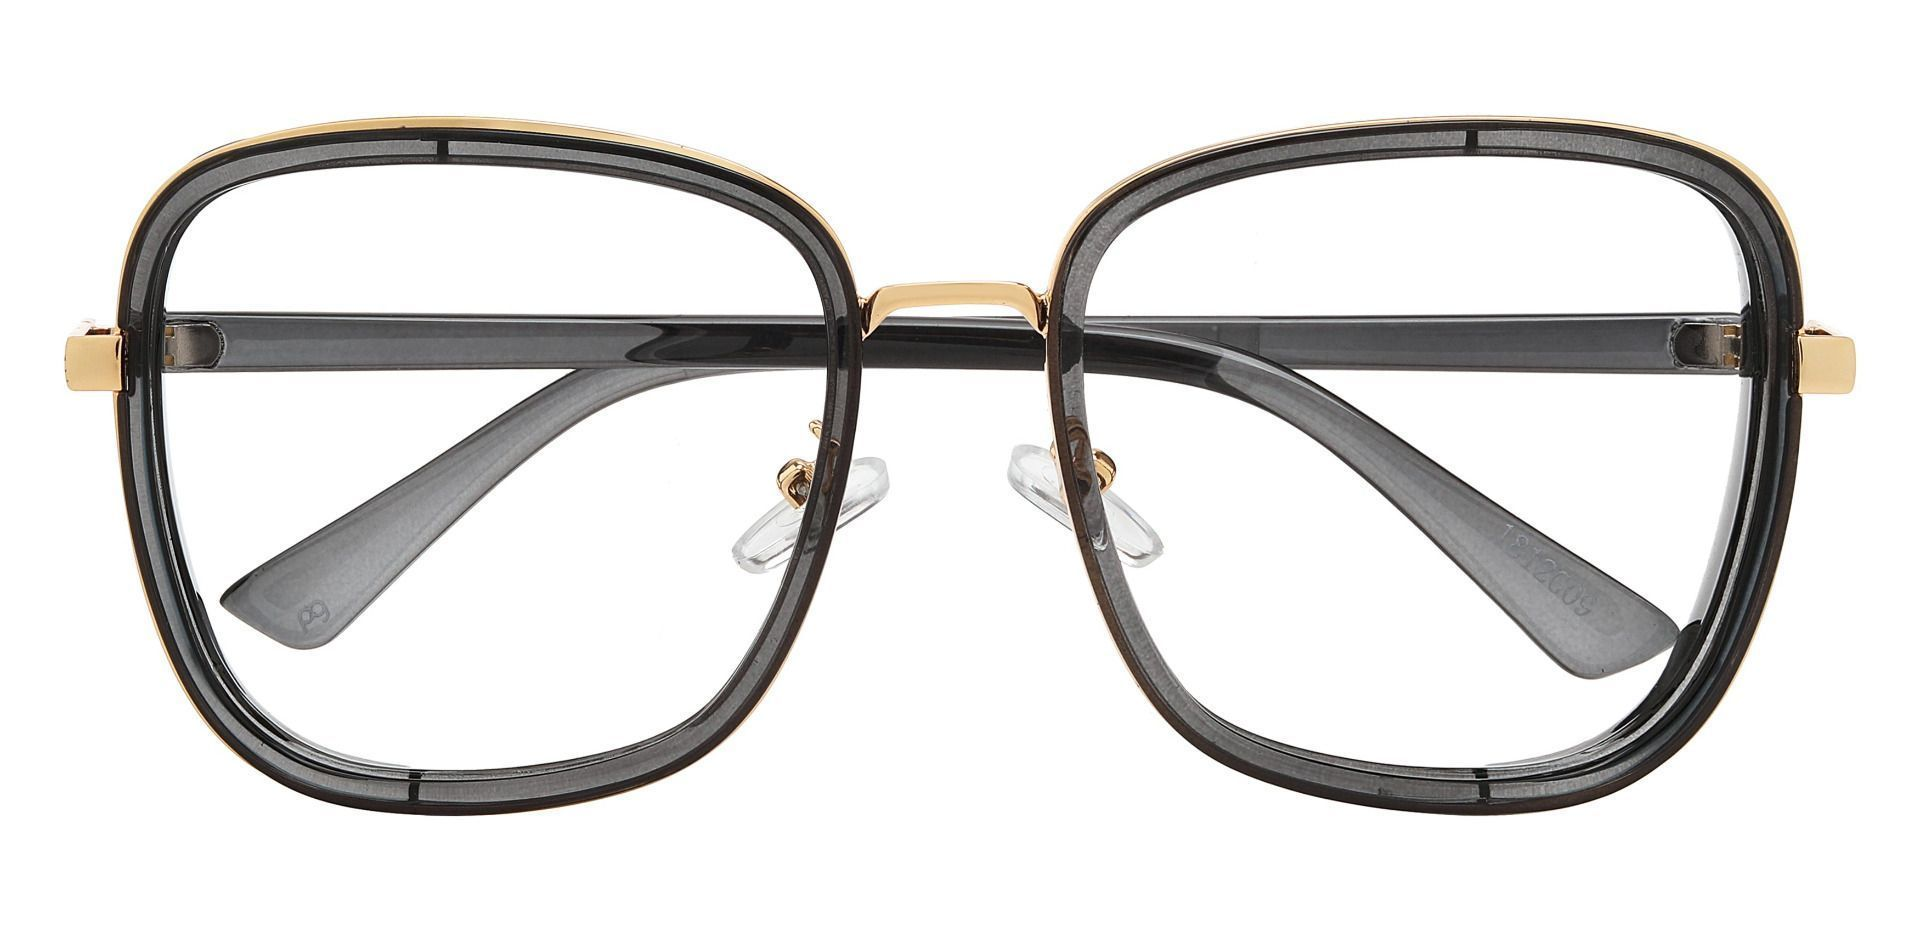 Shimmer Square Single Vision Glasses - Gray